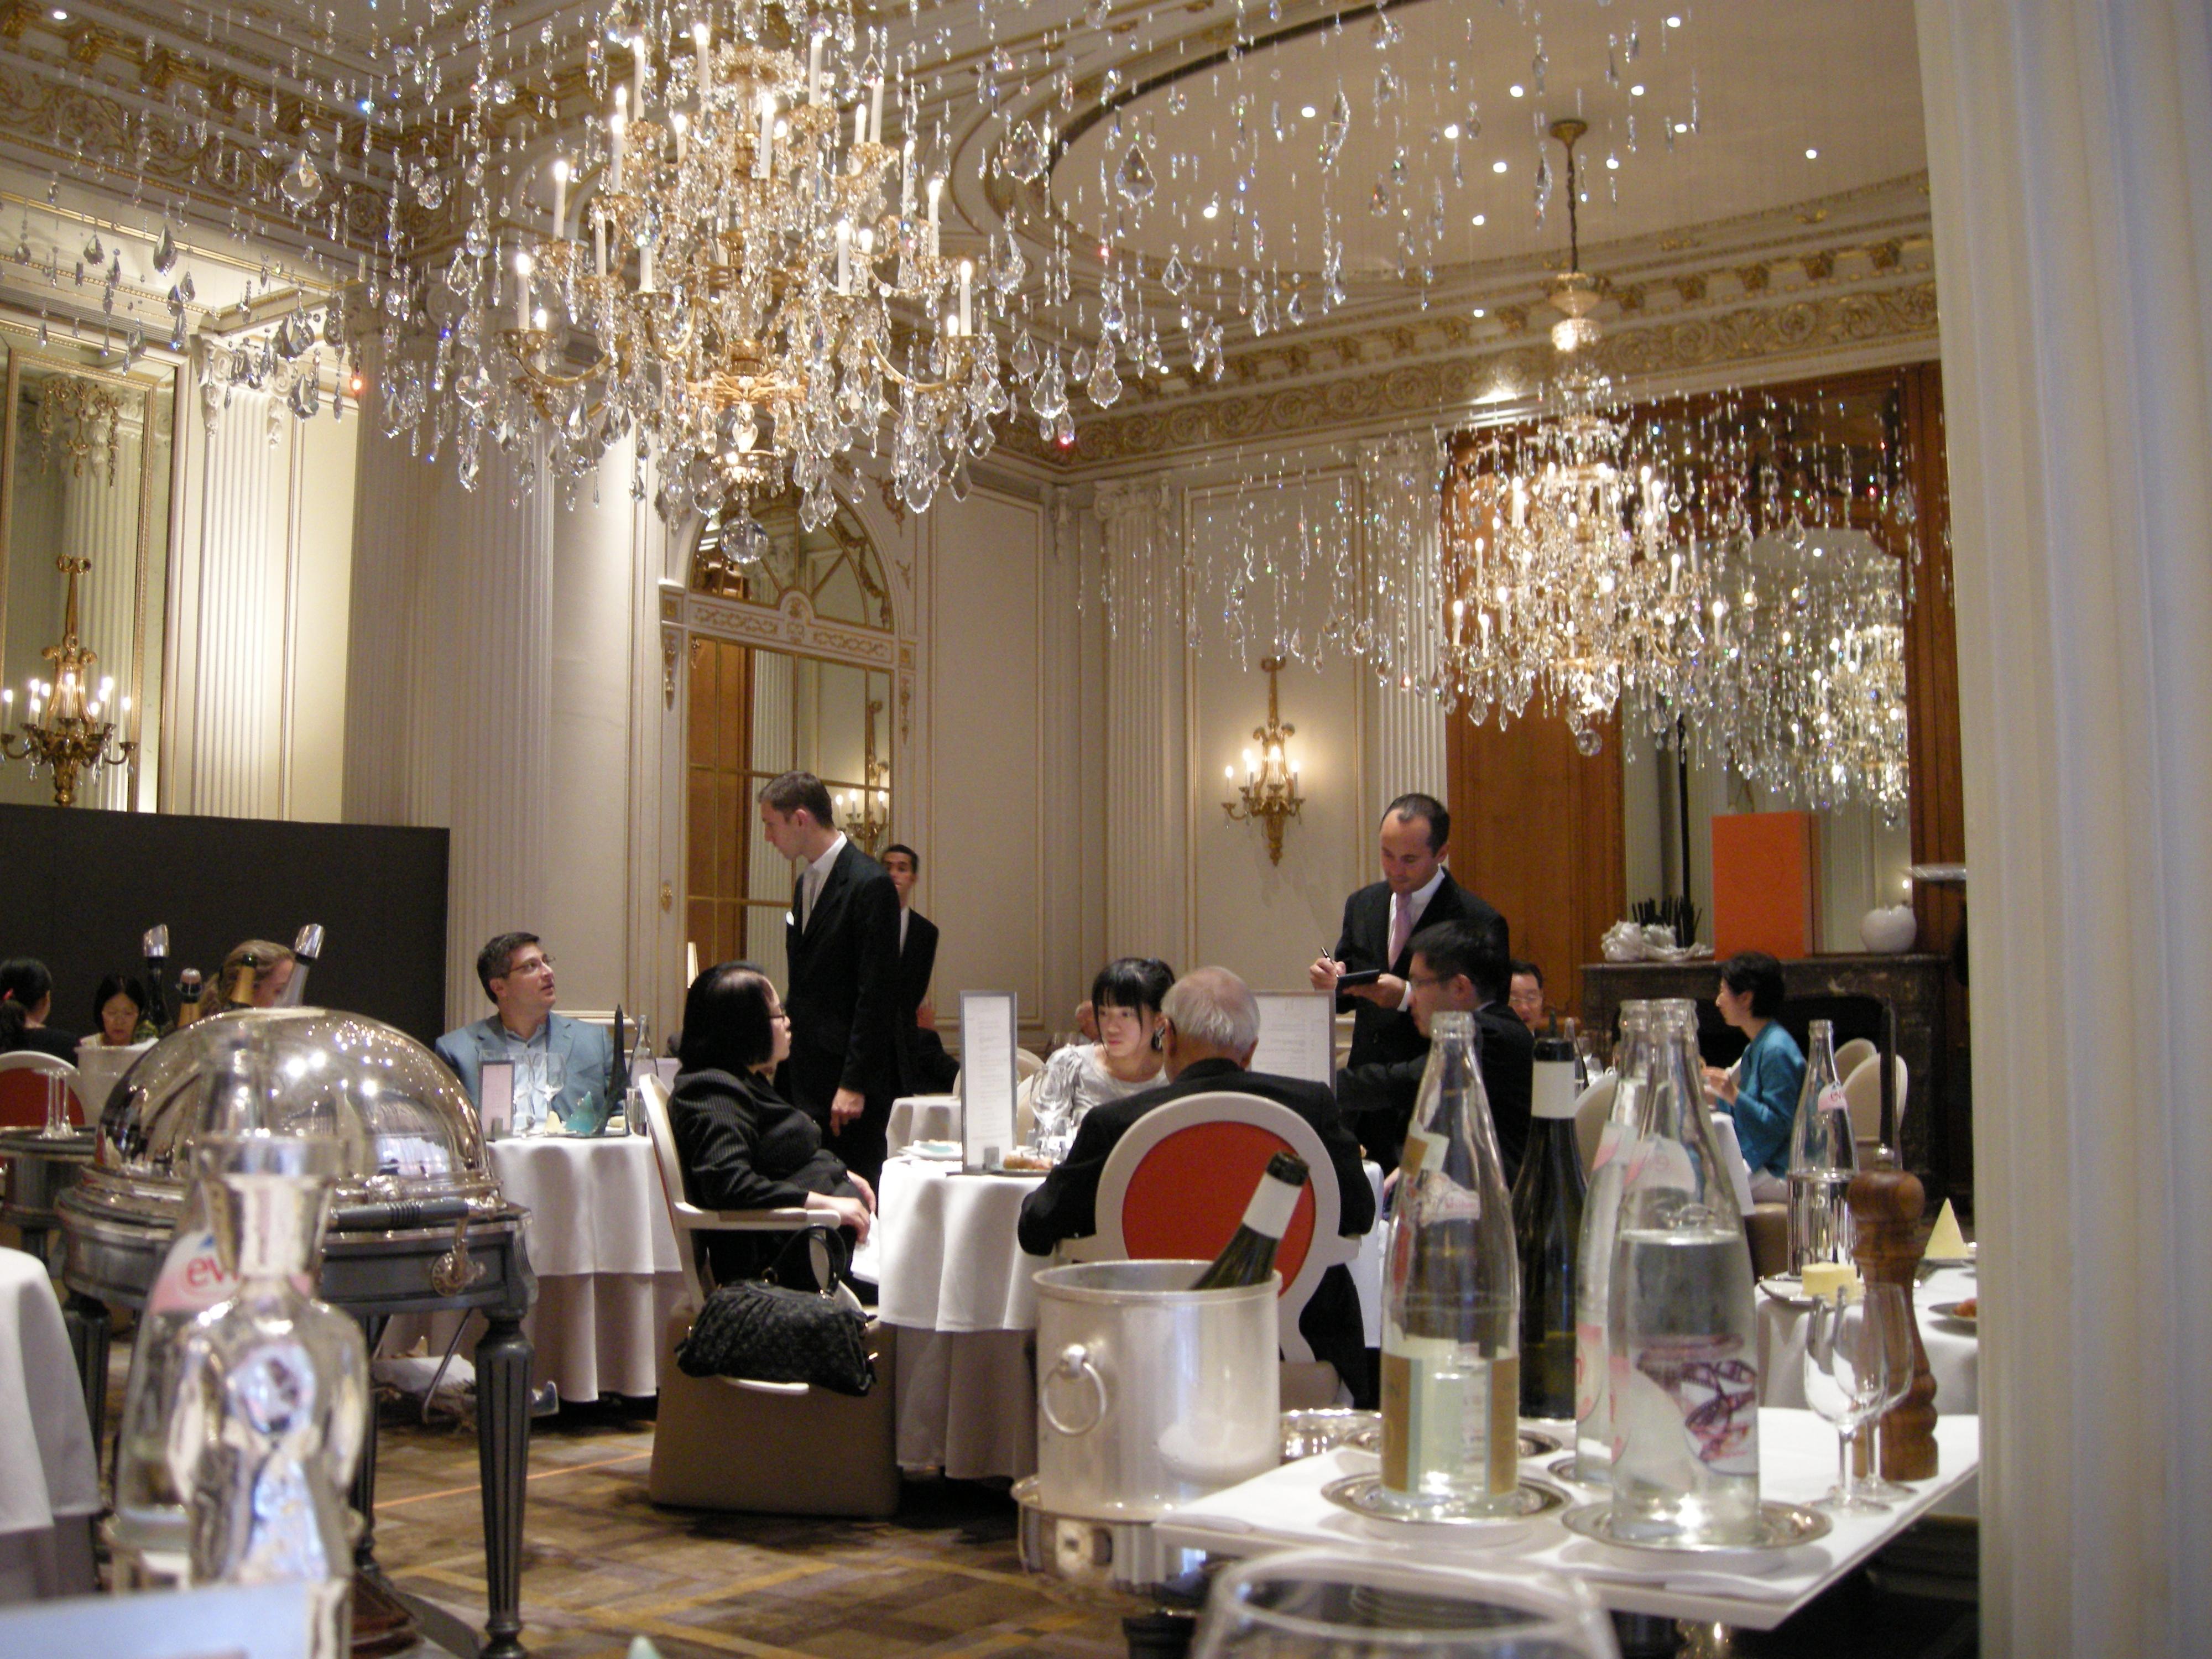 Restaurant Le Louis Xv Alain Ducasse Monte Carlo Etoiles